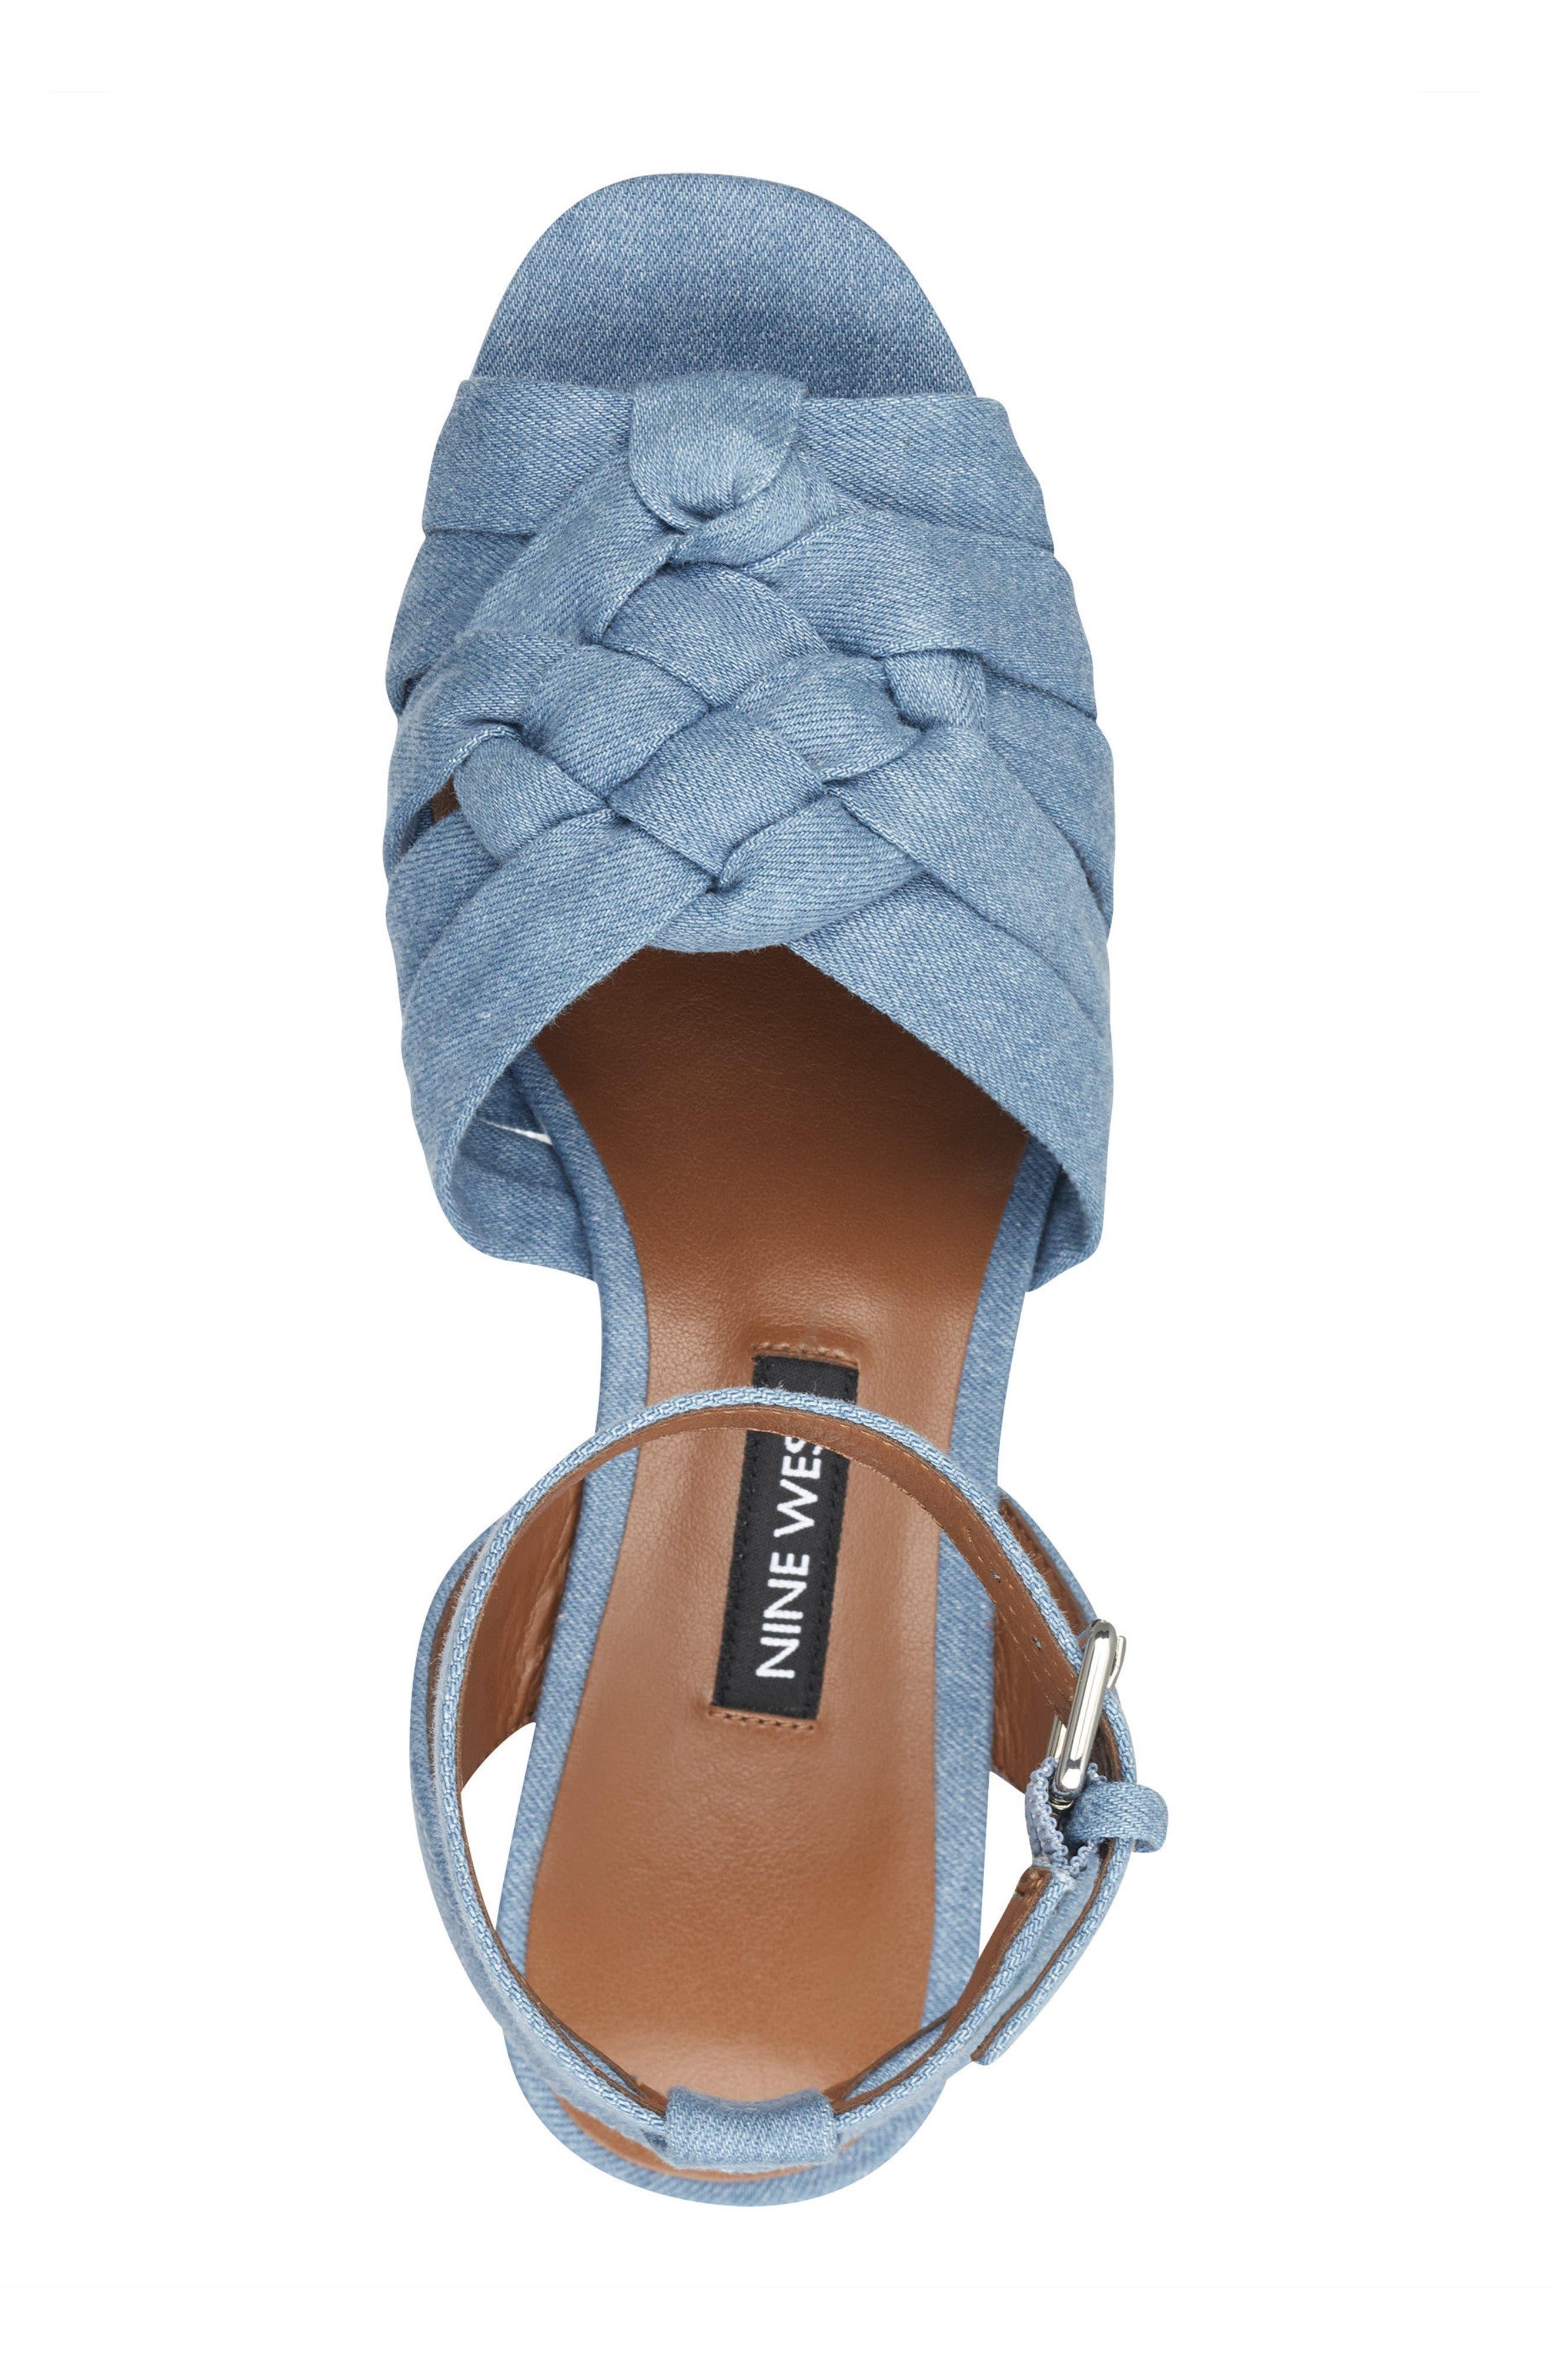 Fetuchini Platform Sandal,                             Alternate thumbnail 5, color,                             LIGHT BLUE DENIM